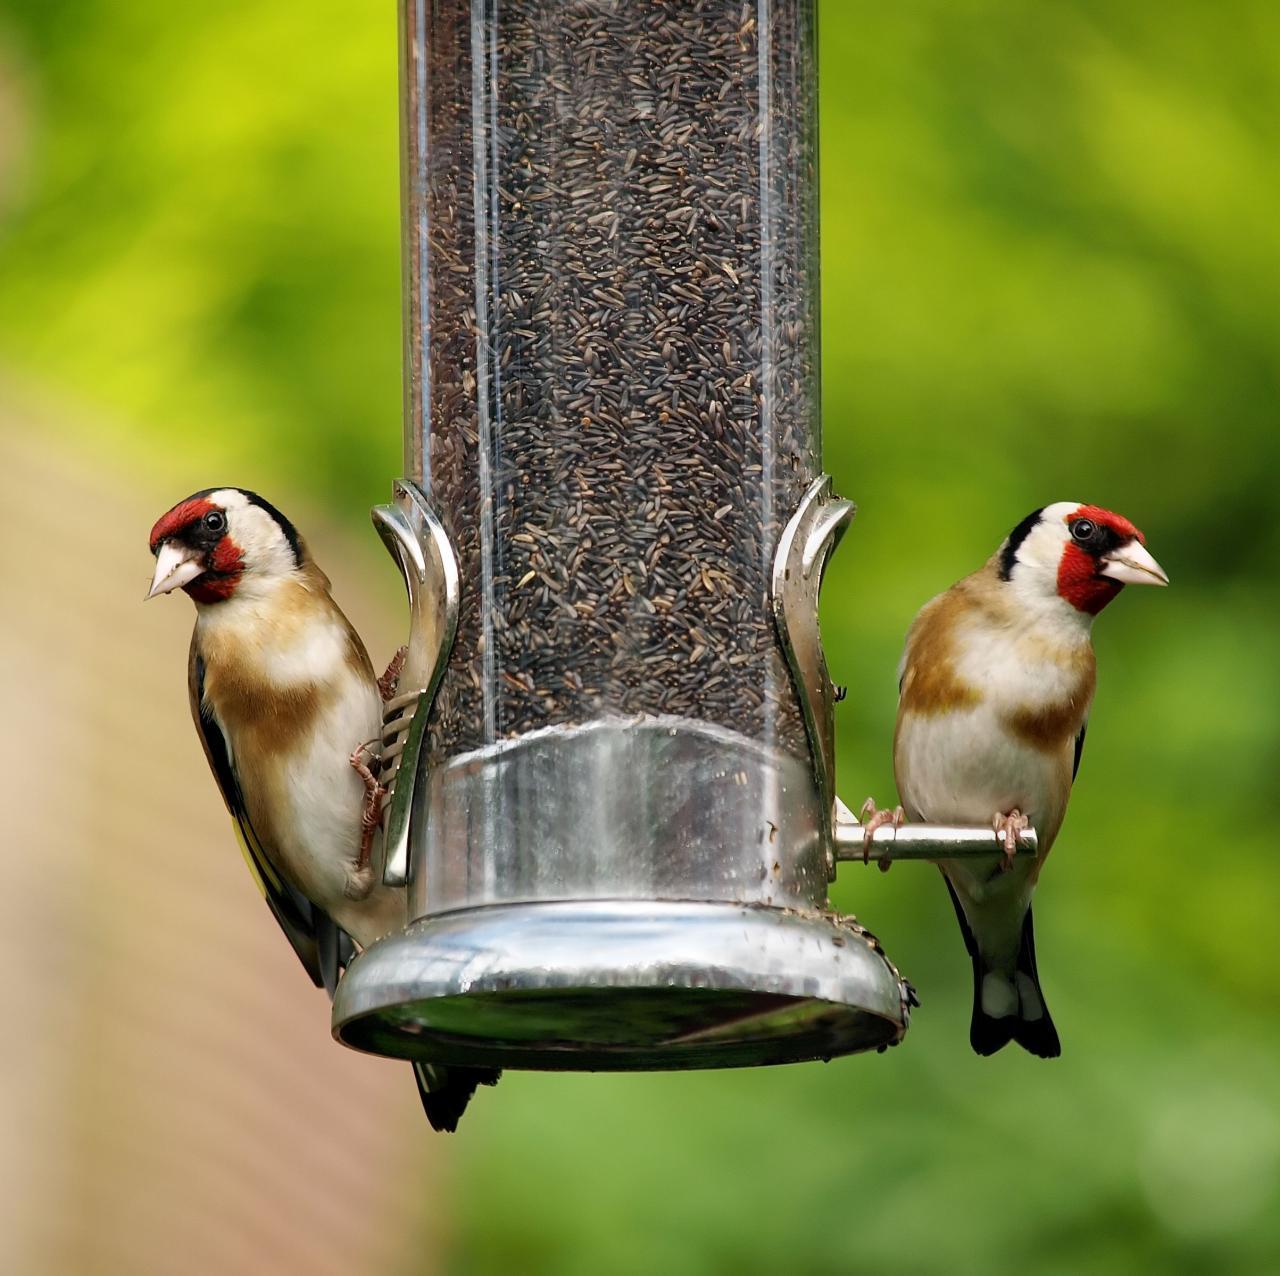 8 Kitchen Scraps Safe To Feed Birds – Wild Birds Leftover Food Uses